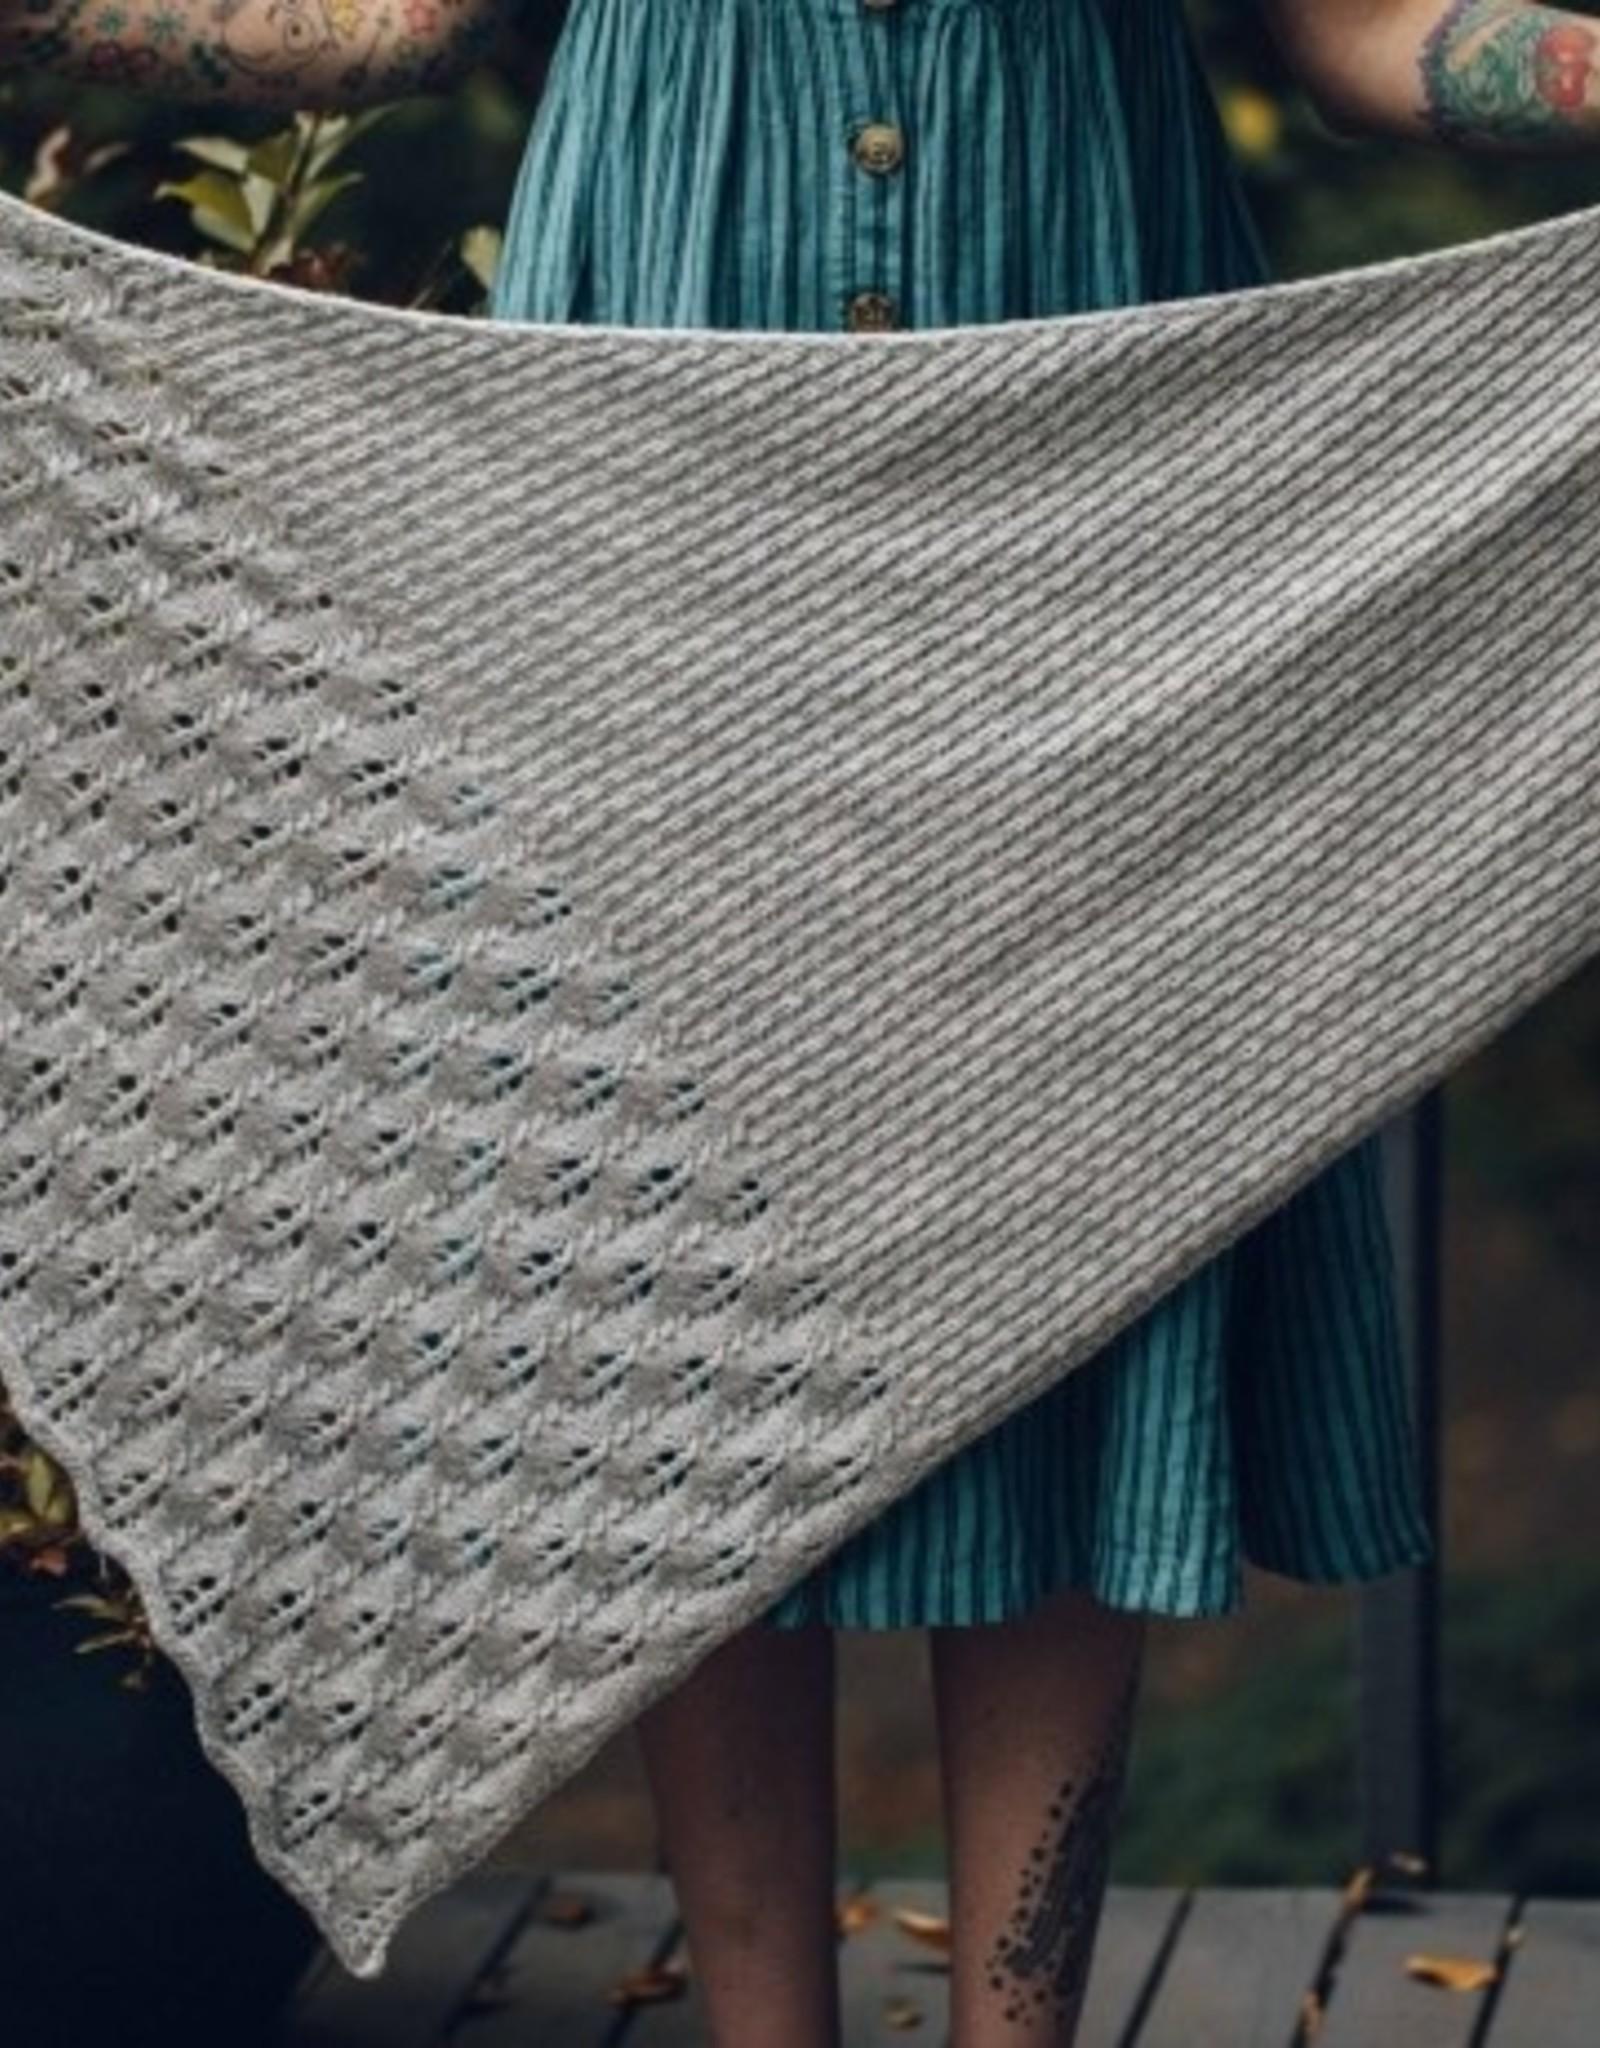 Knit Project - Hoarfrost Shawl (Class A)